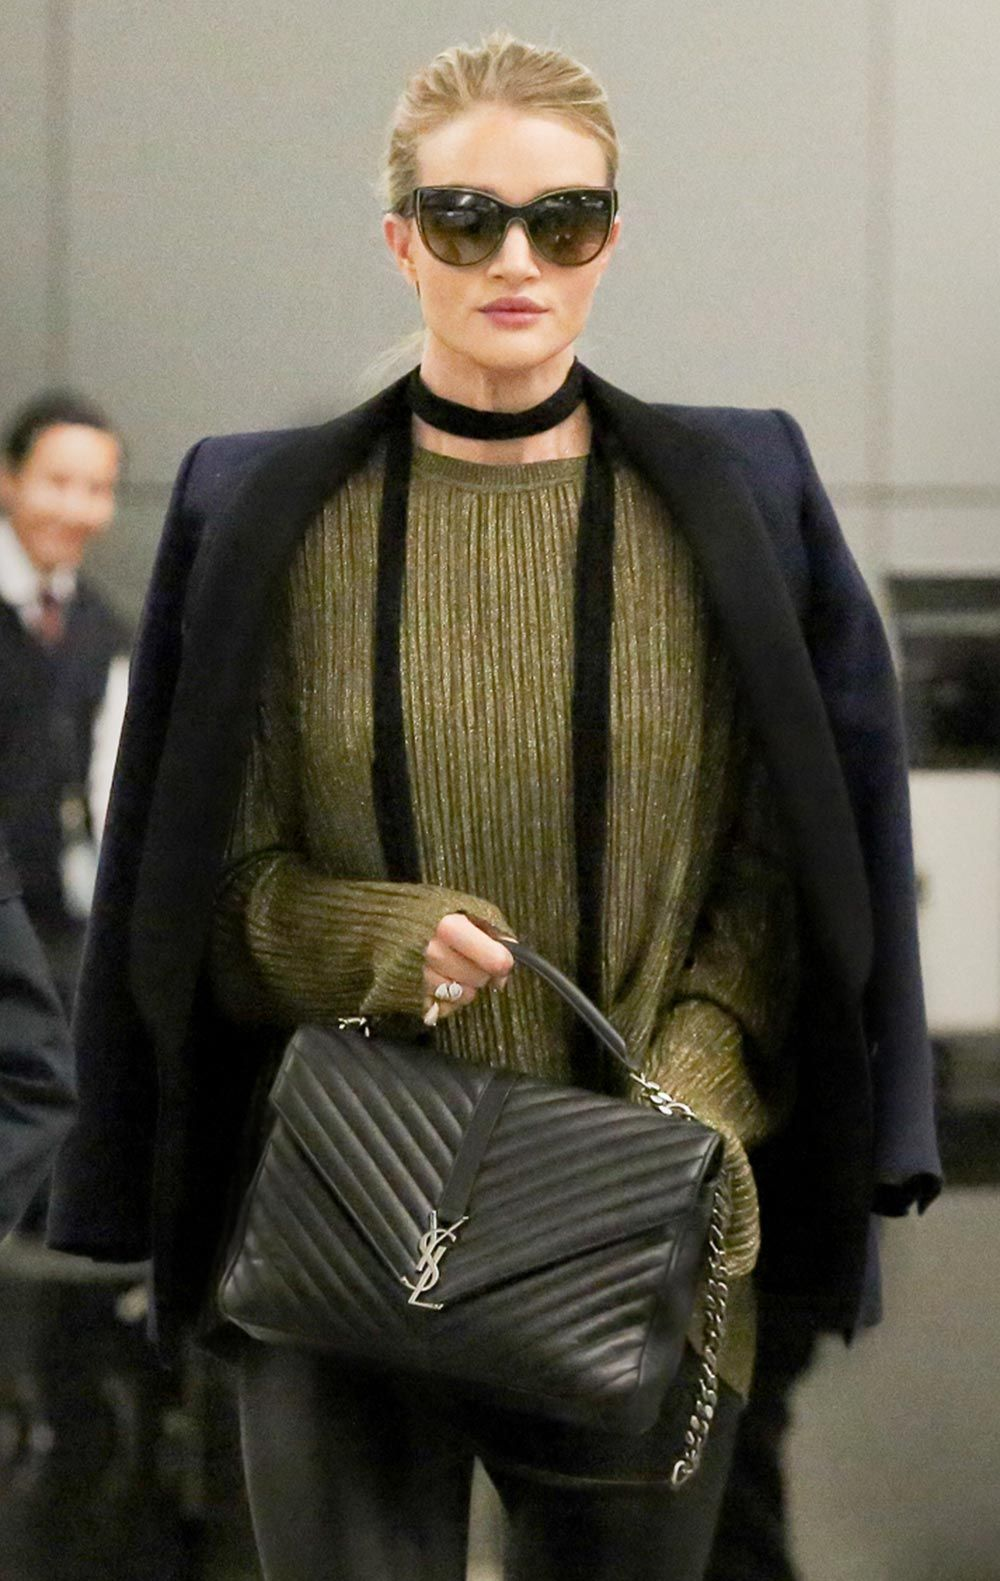 Meet the new Celebrity bag du jour Celebrity style, Met